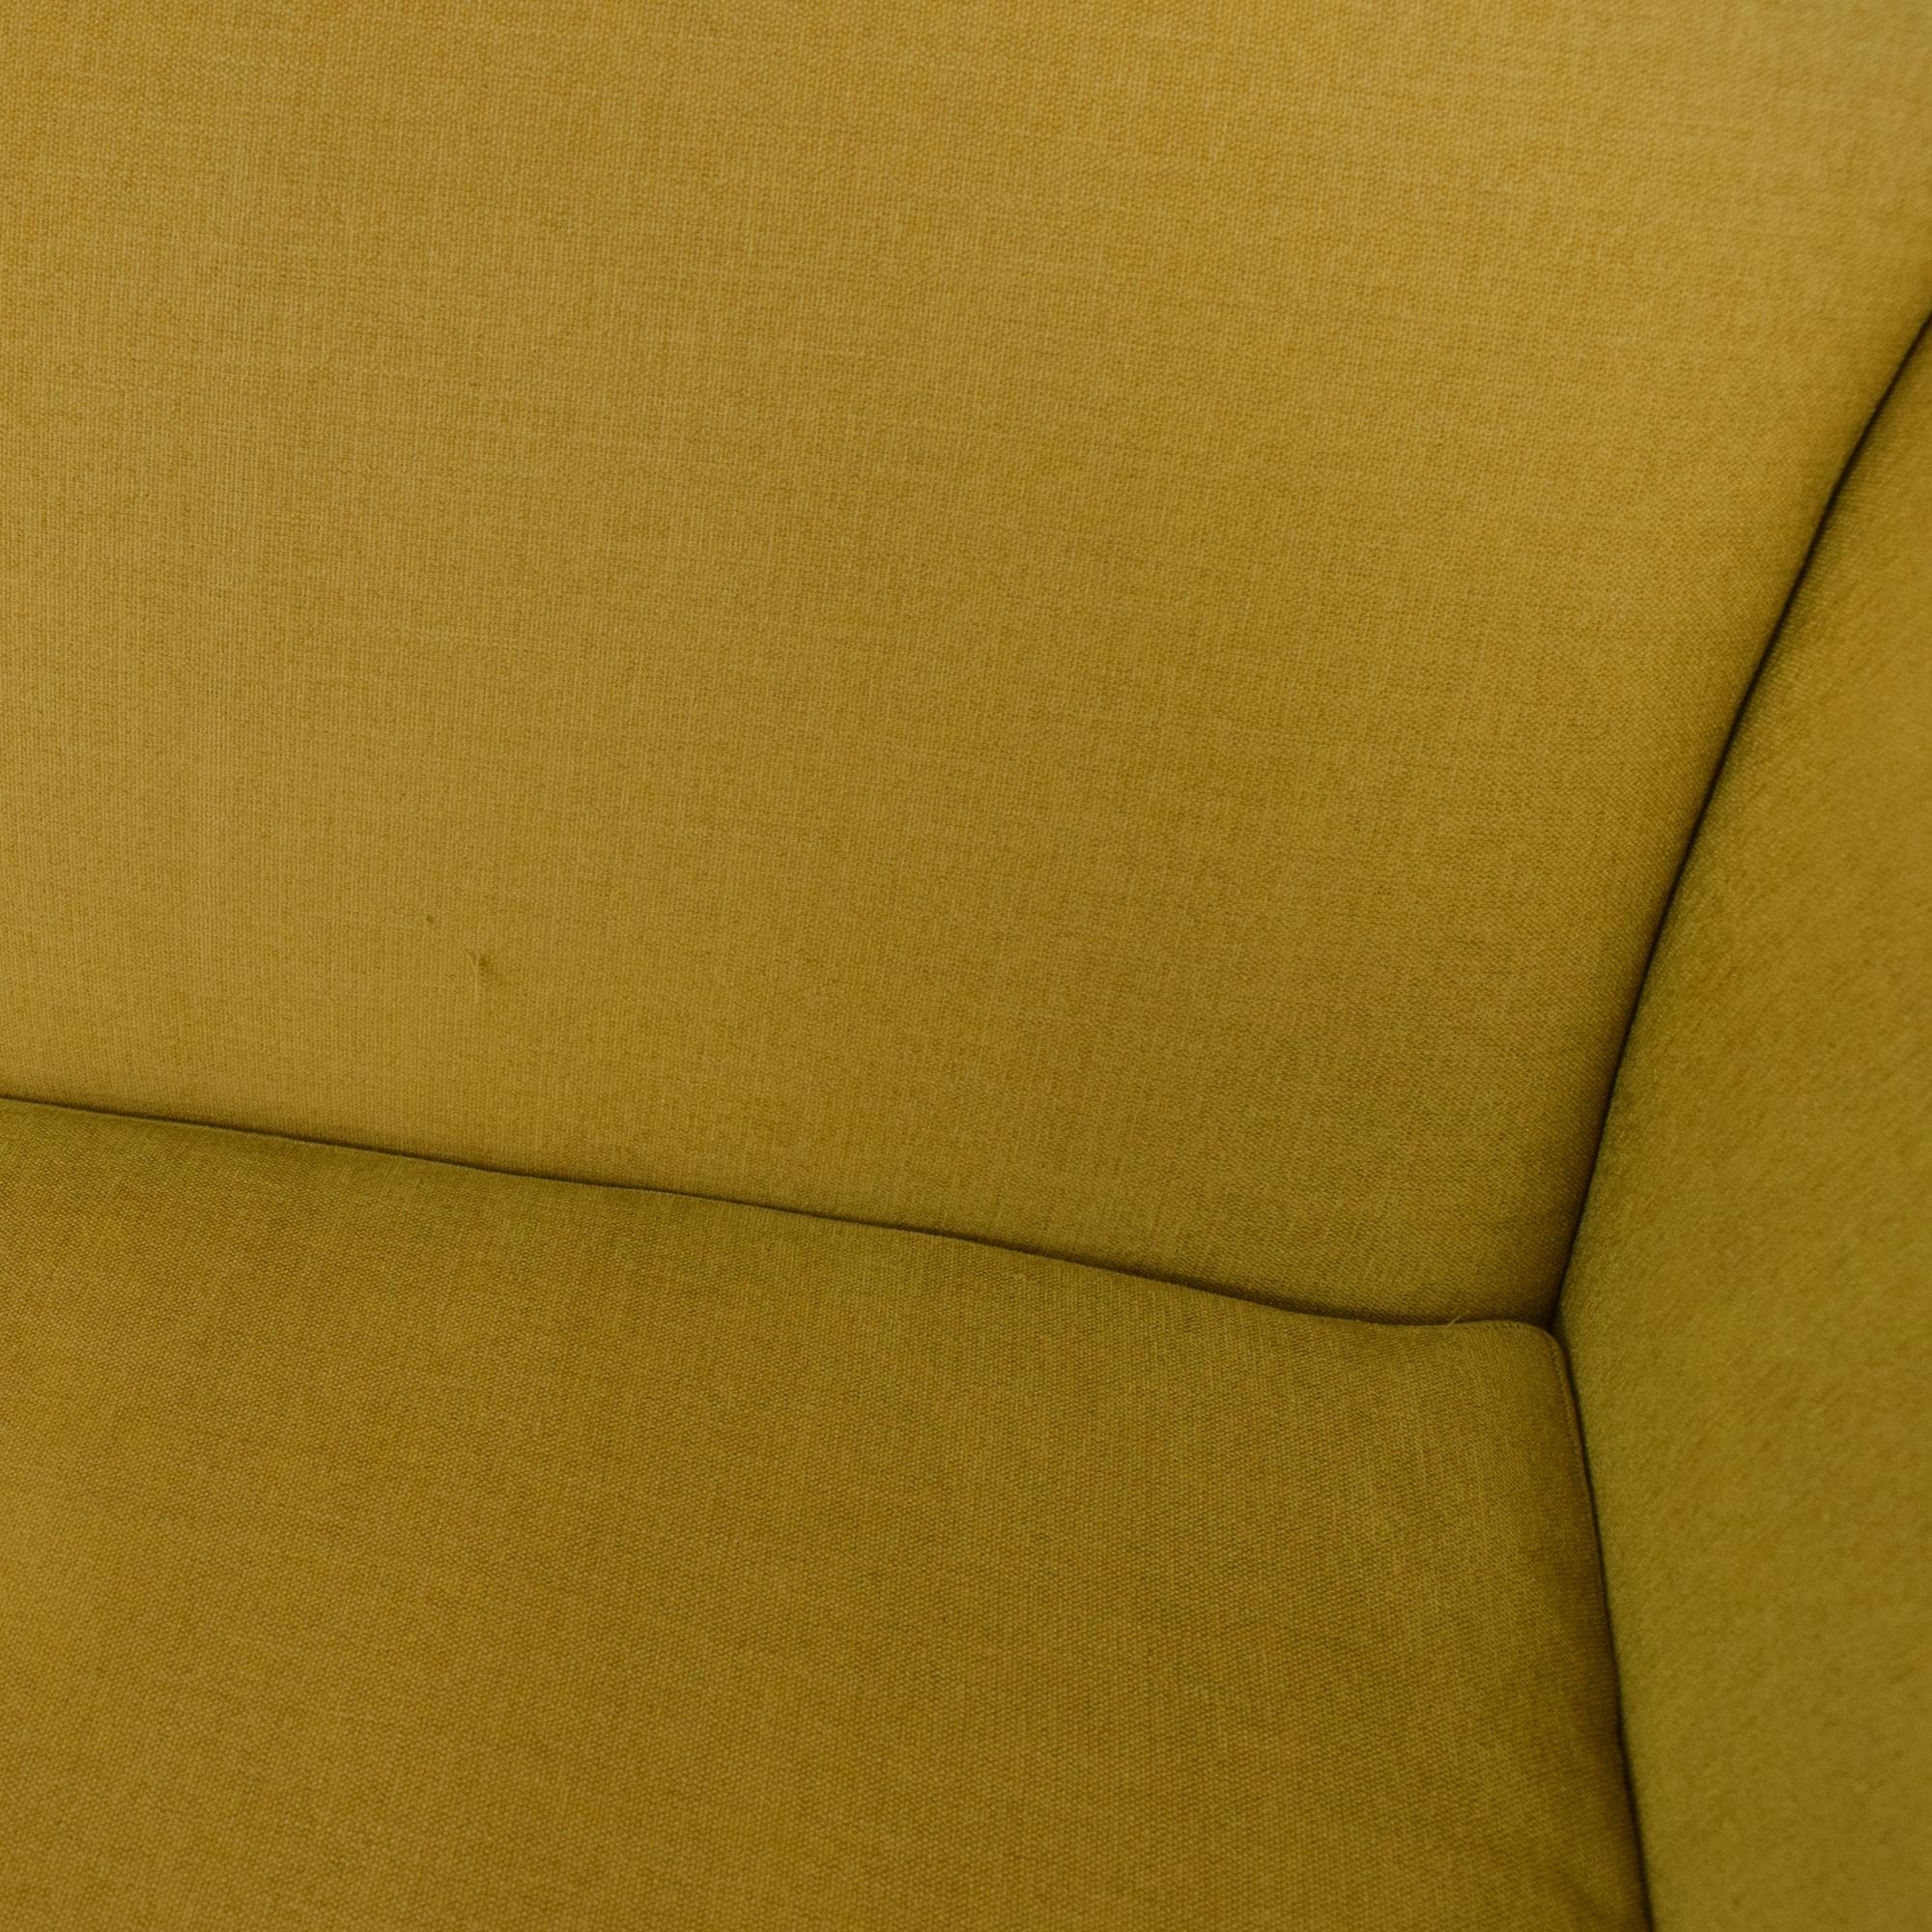 Crate & Barrel Silhouette Sofa sale